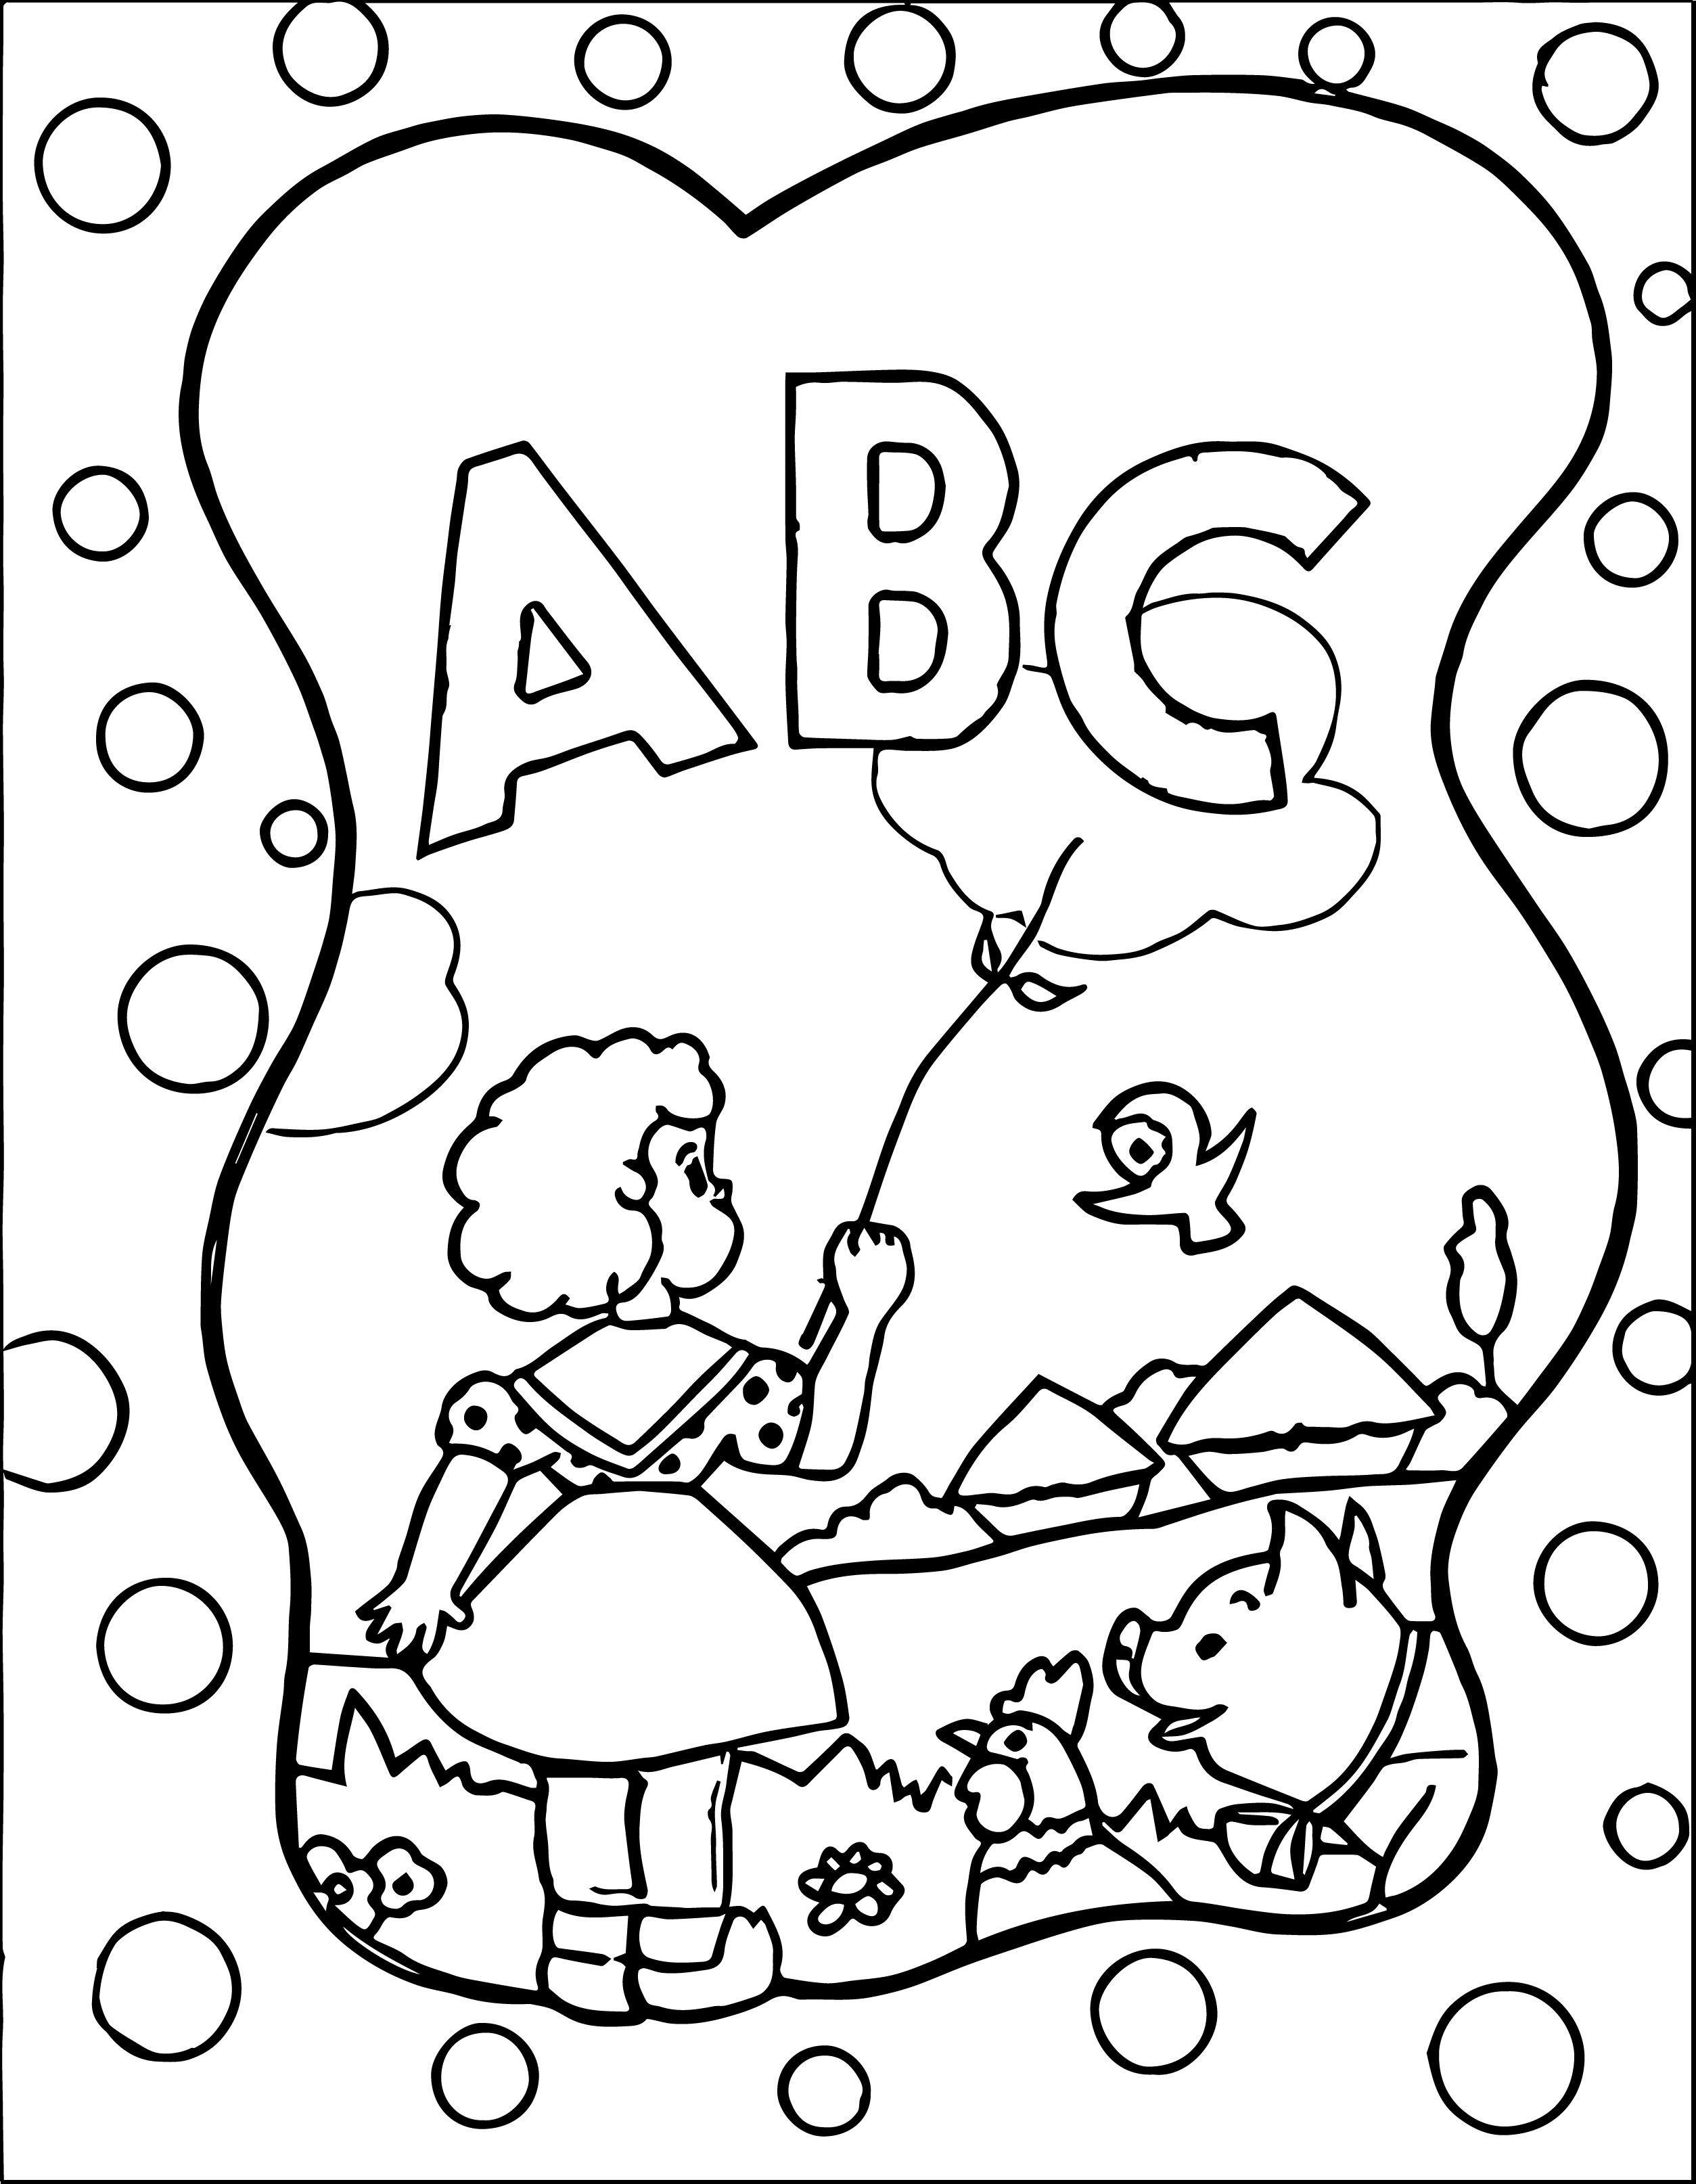 Excelente Noahs Ark Para Colorear Imprimible Embellecimiento - Ideas ...